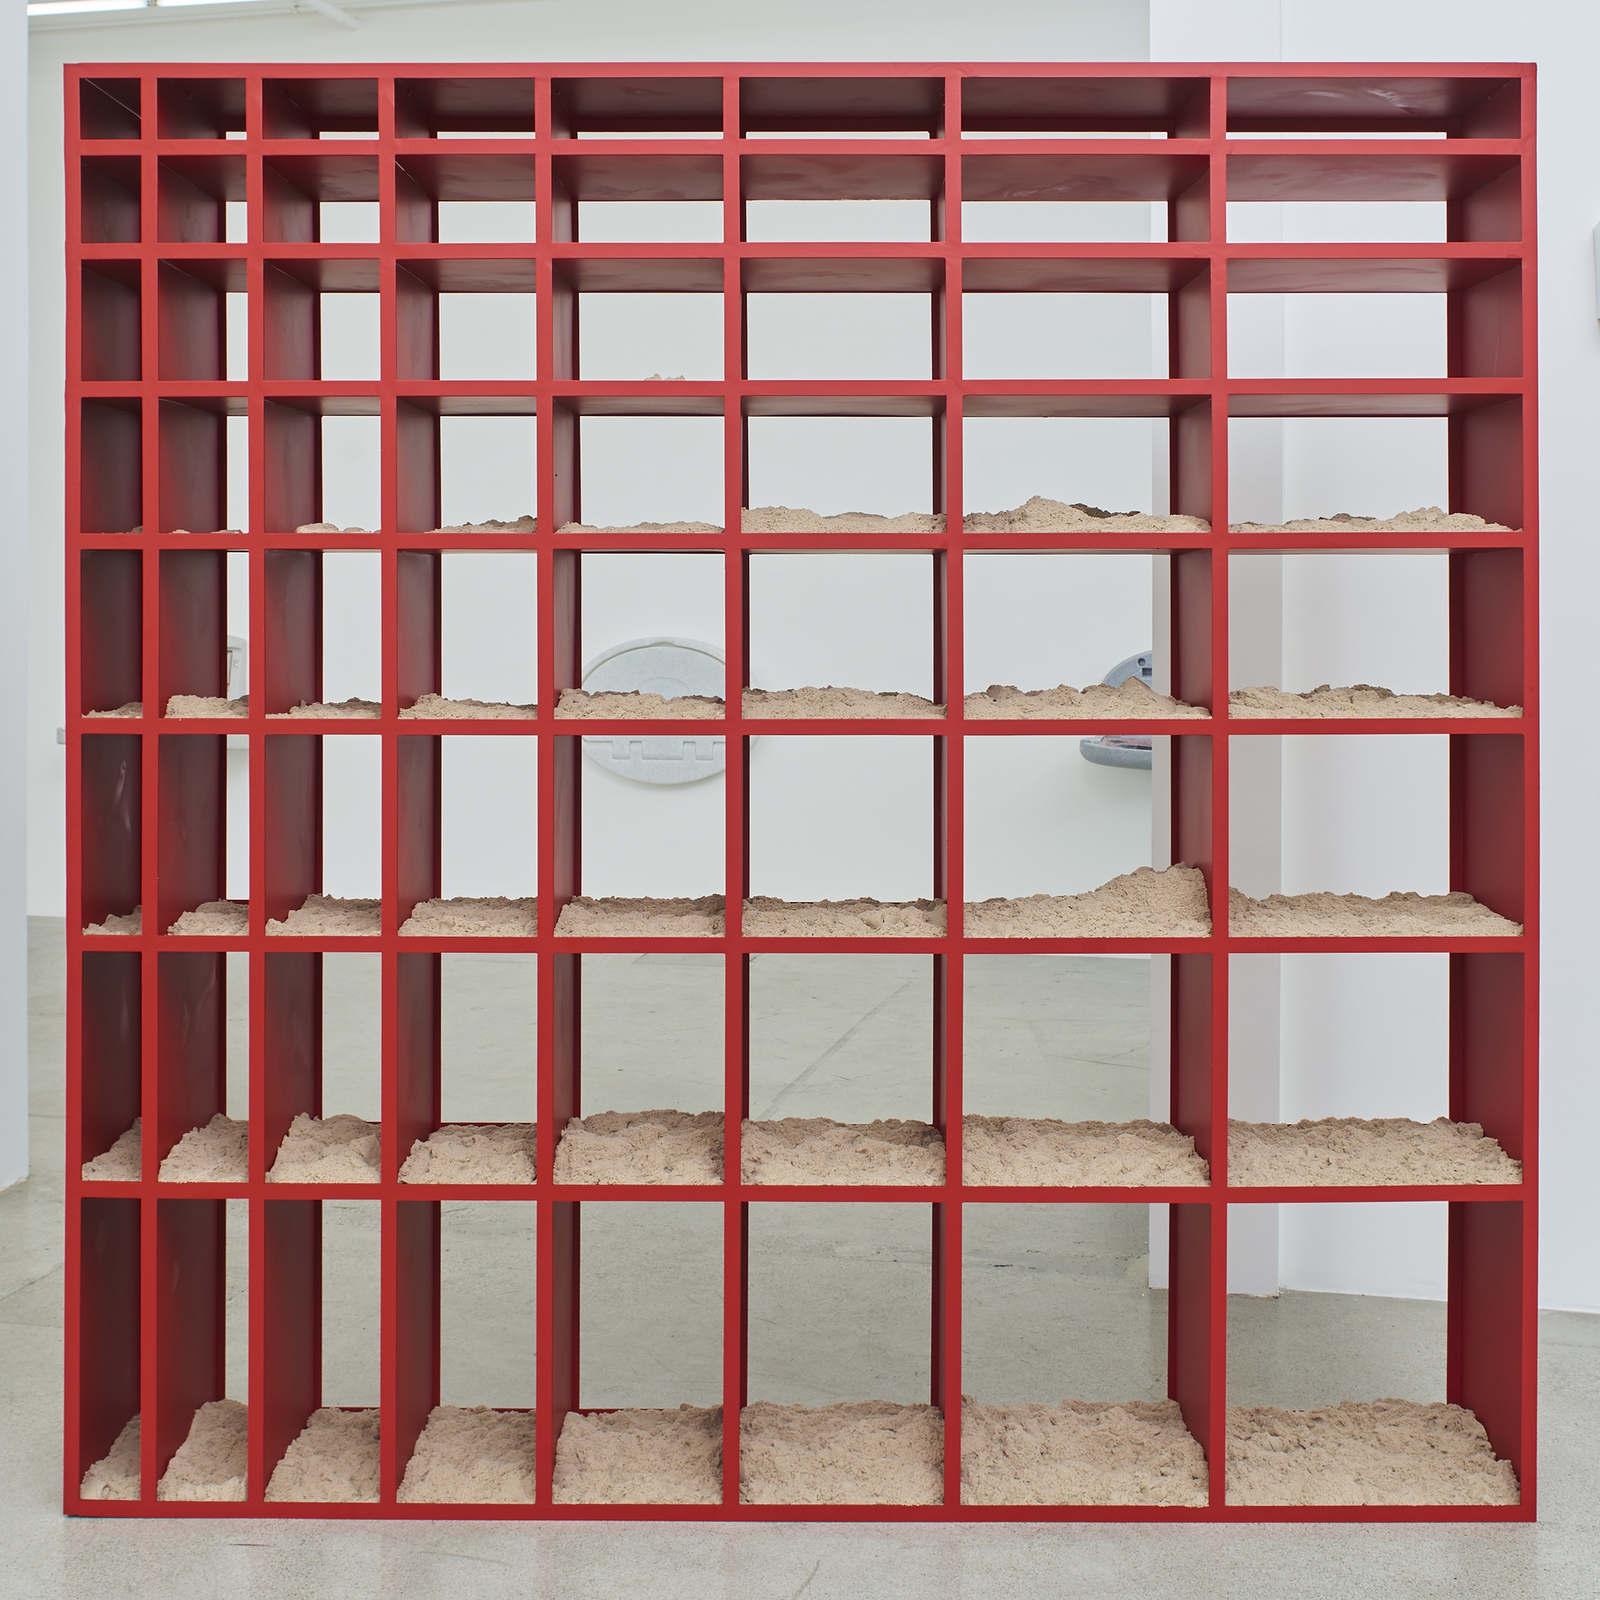 Wermers_Sand Shelf #2, 2016-2017_Powdercoated steel, kinetic sand_91 7_16 x 91 7_16 x 16_NW00037ST